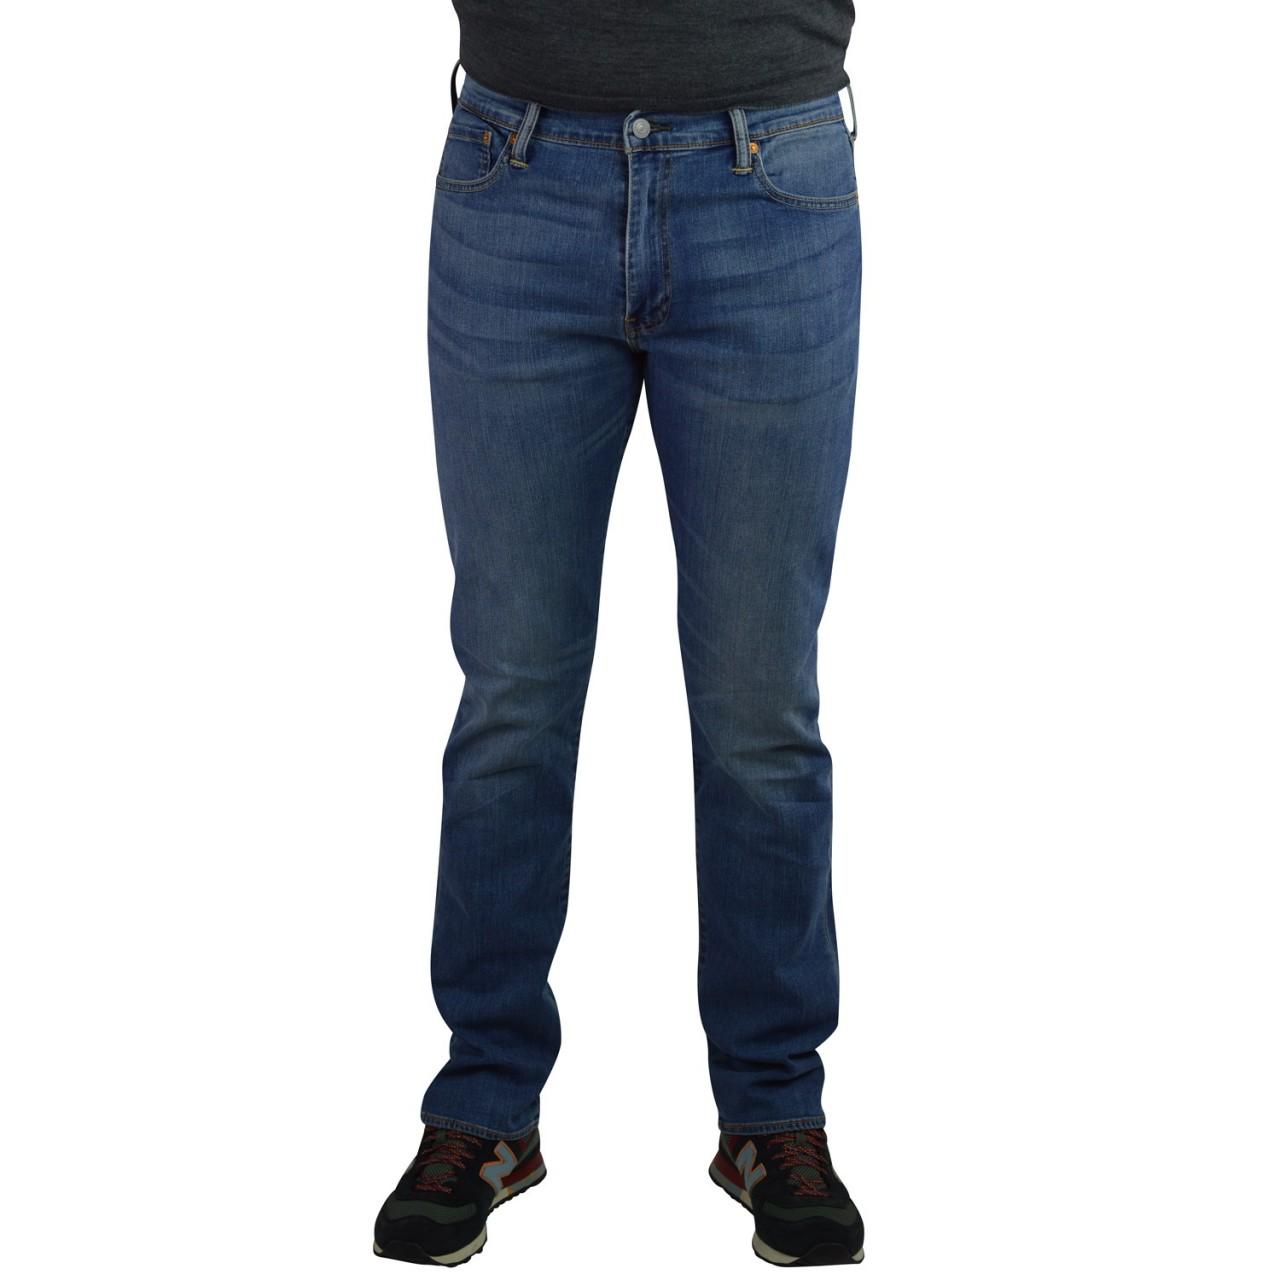 Levi's Uomo Jeans Levi's Uomo 510 Blue Canyon 5100394C